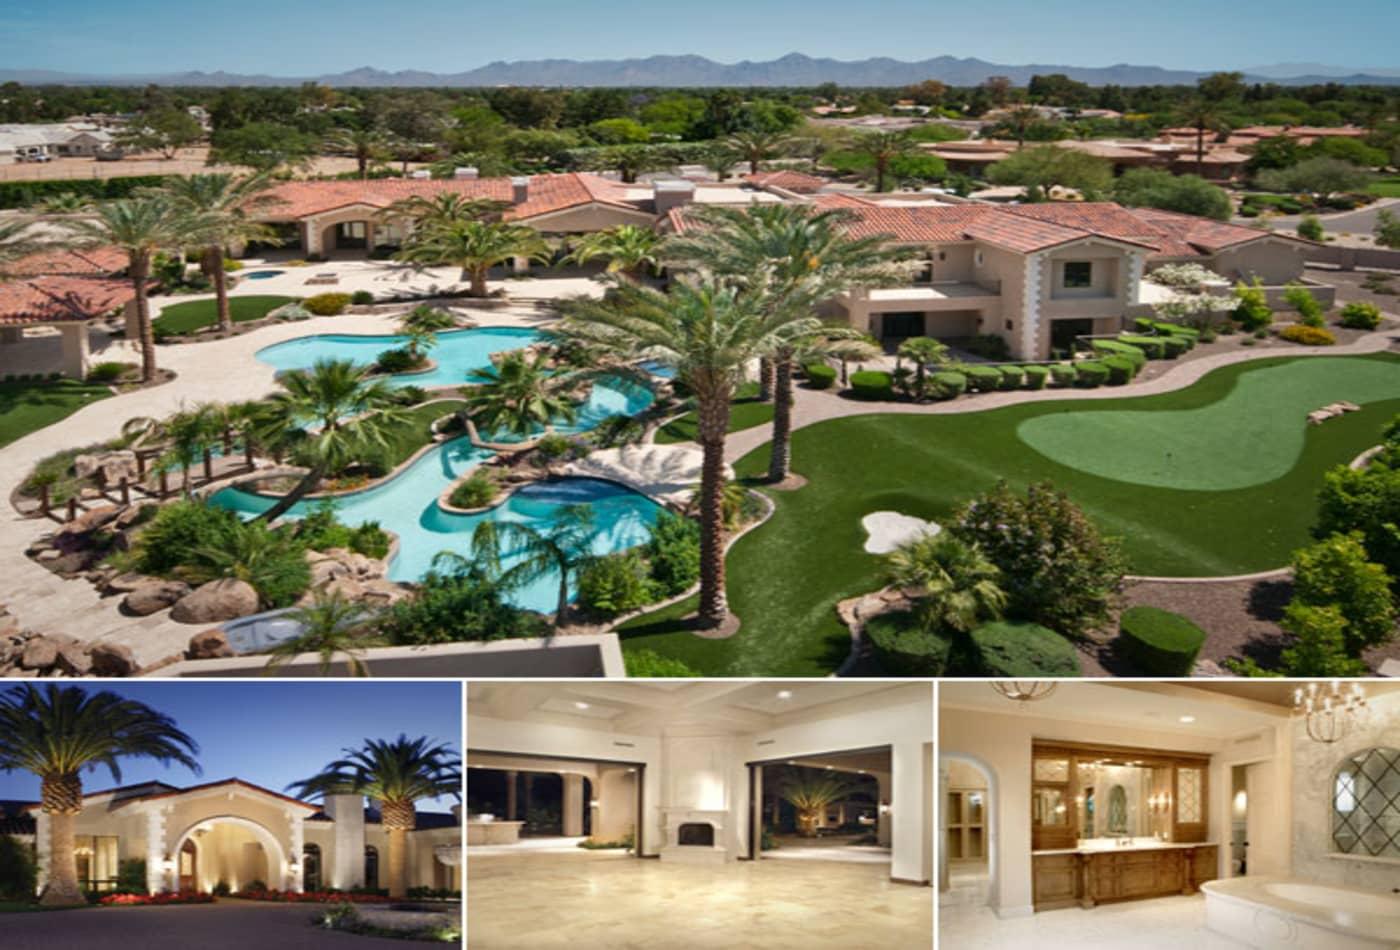 Arizona-Fun-House-Unique-Million-Dollar-Homes-CNBC.jpg